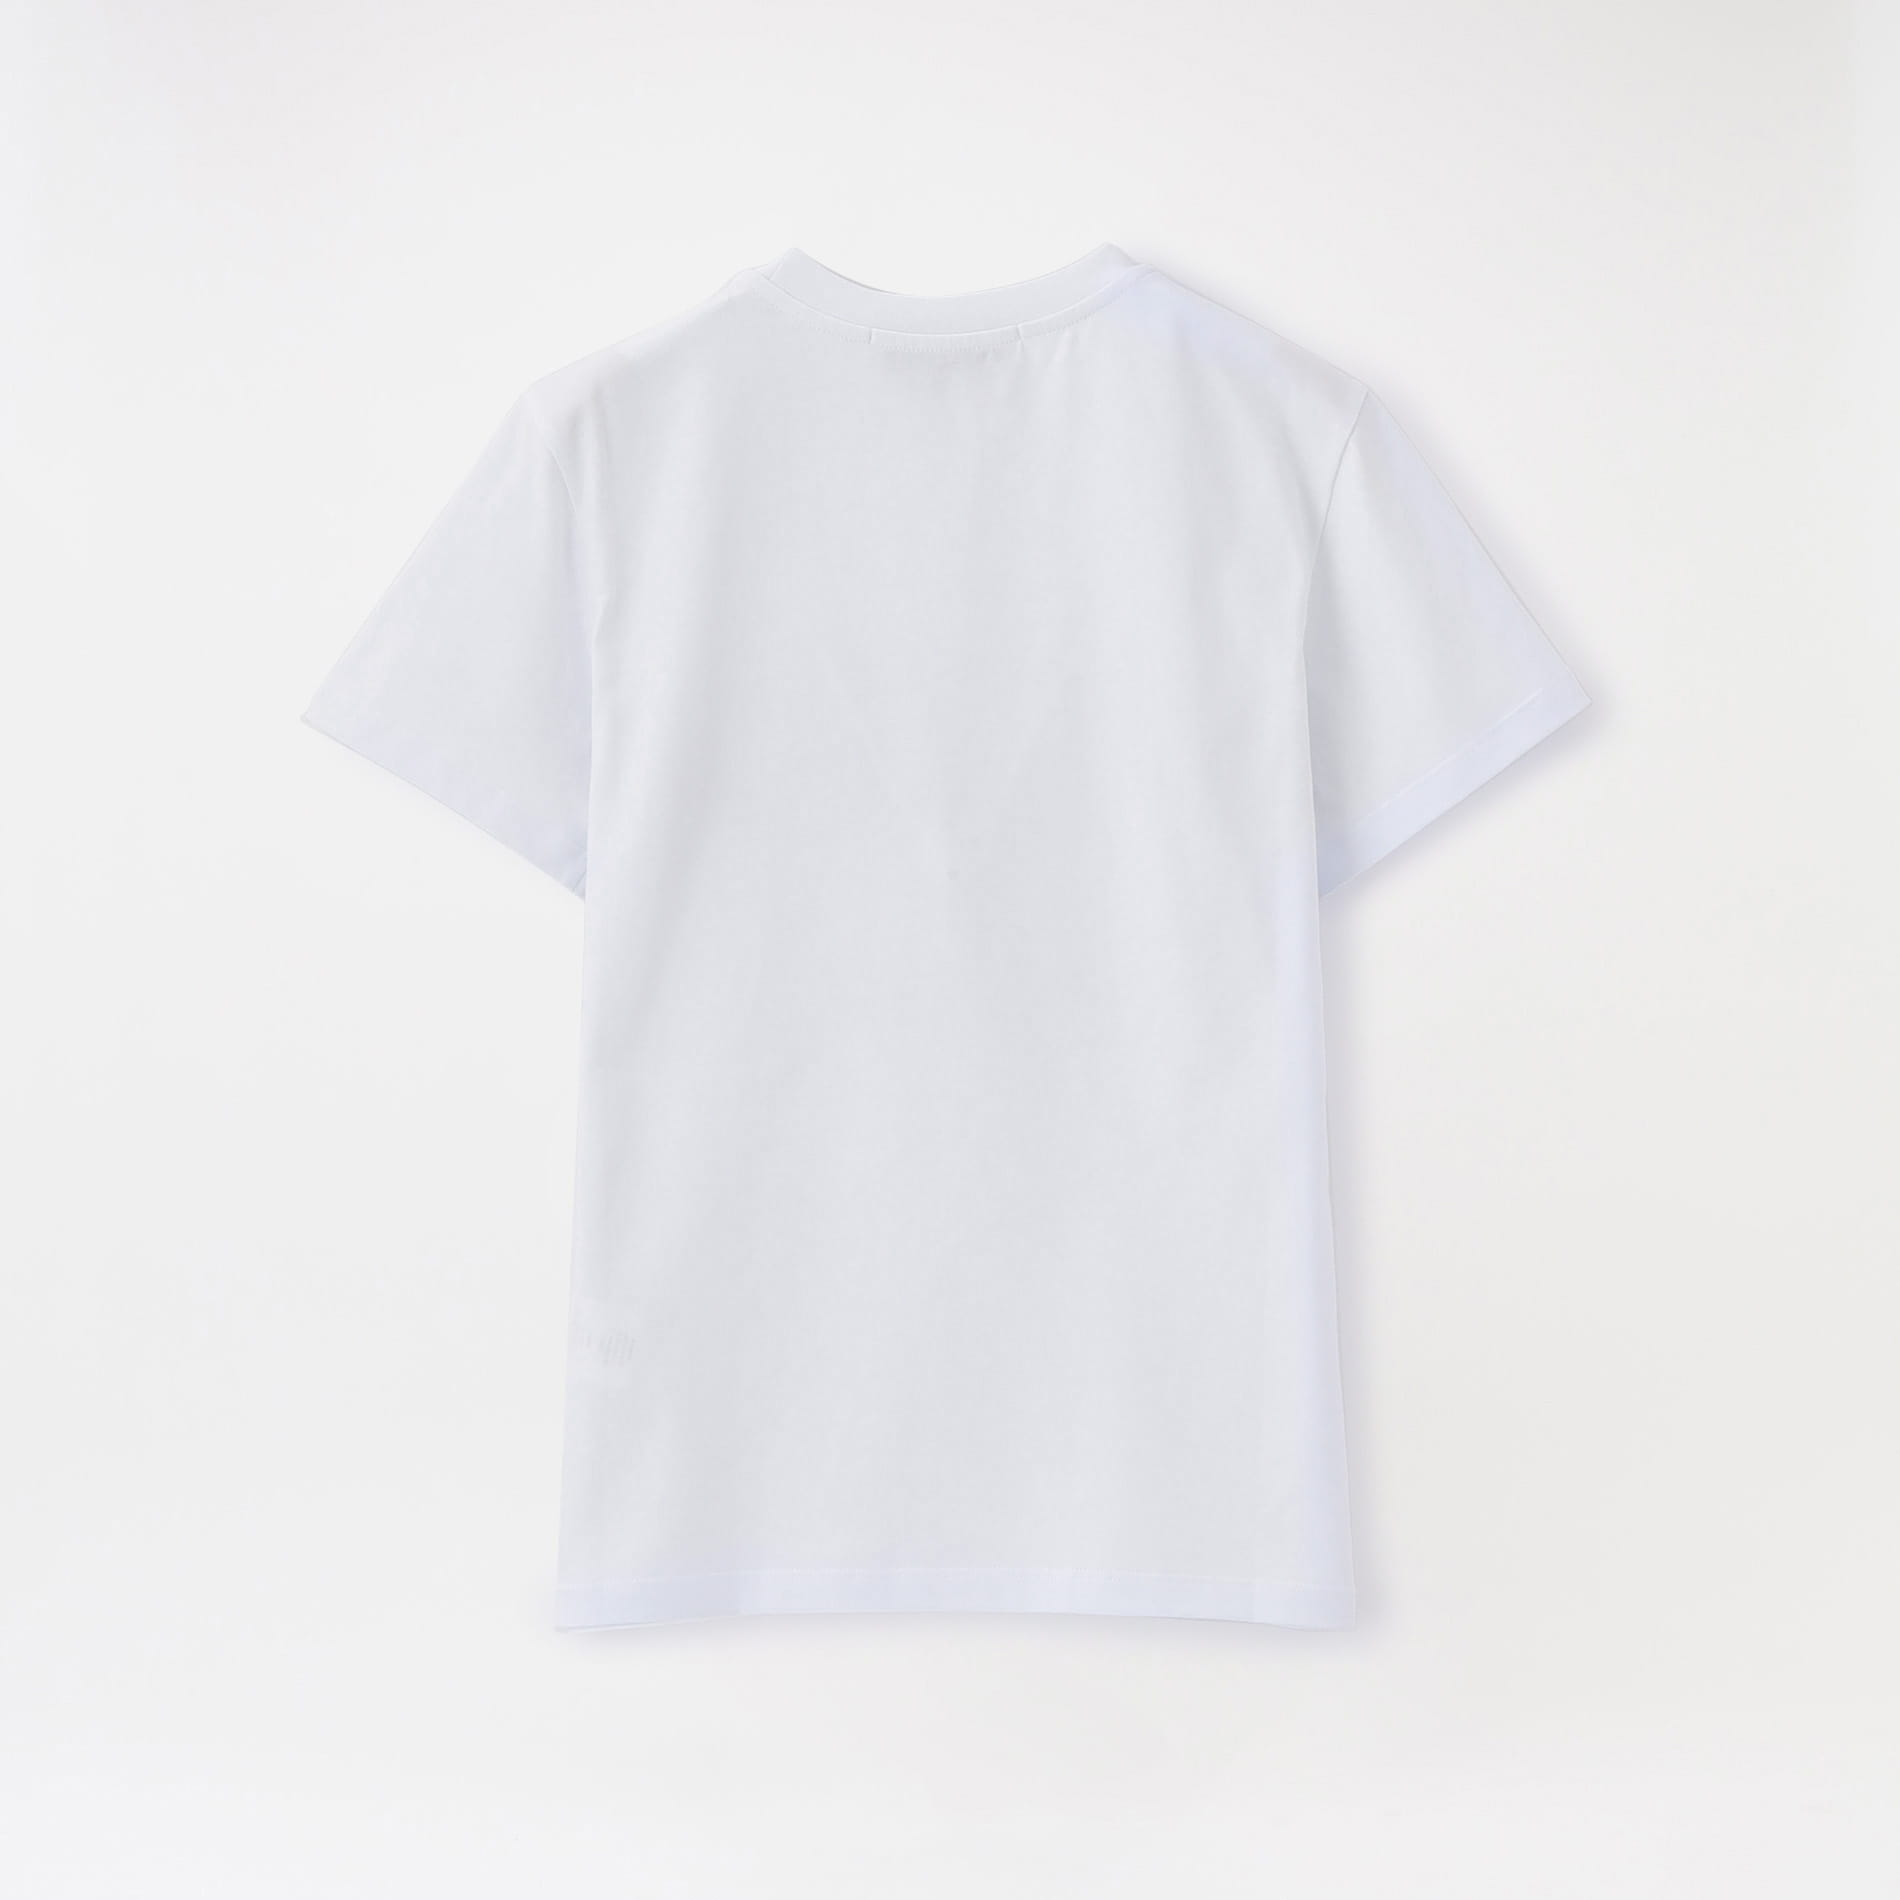 【MSGM】WOMEN T-SHIRT MSGM BRUSH LOGO 2941MDM60 6336